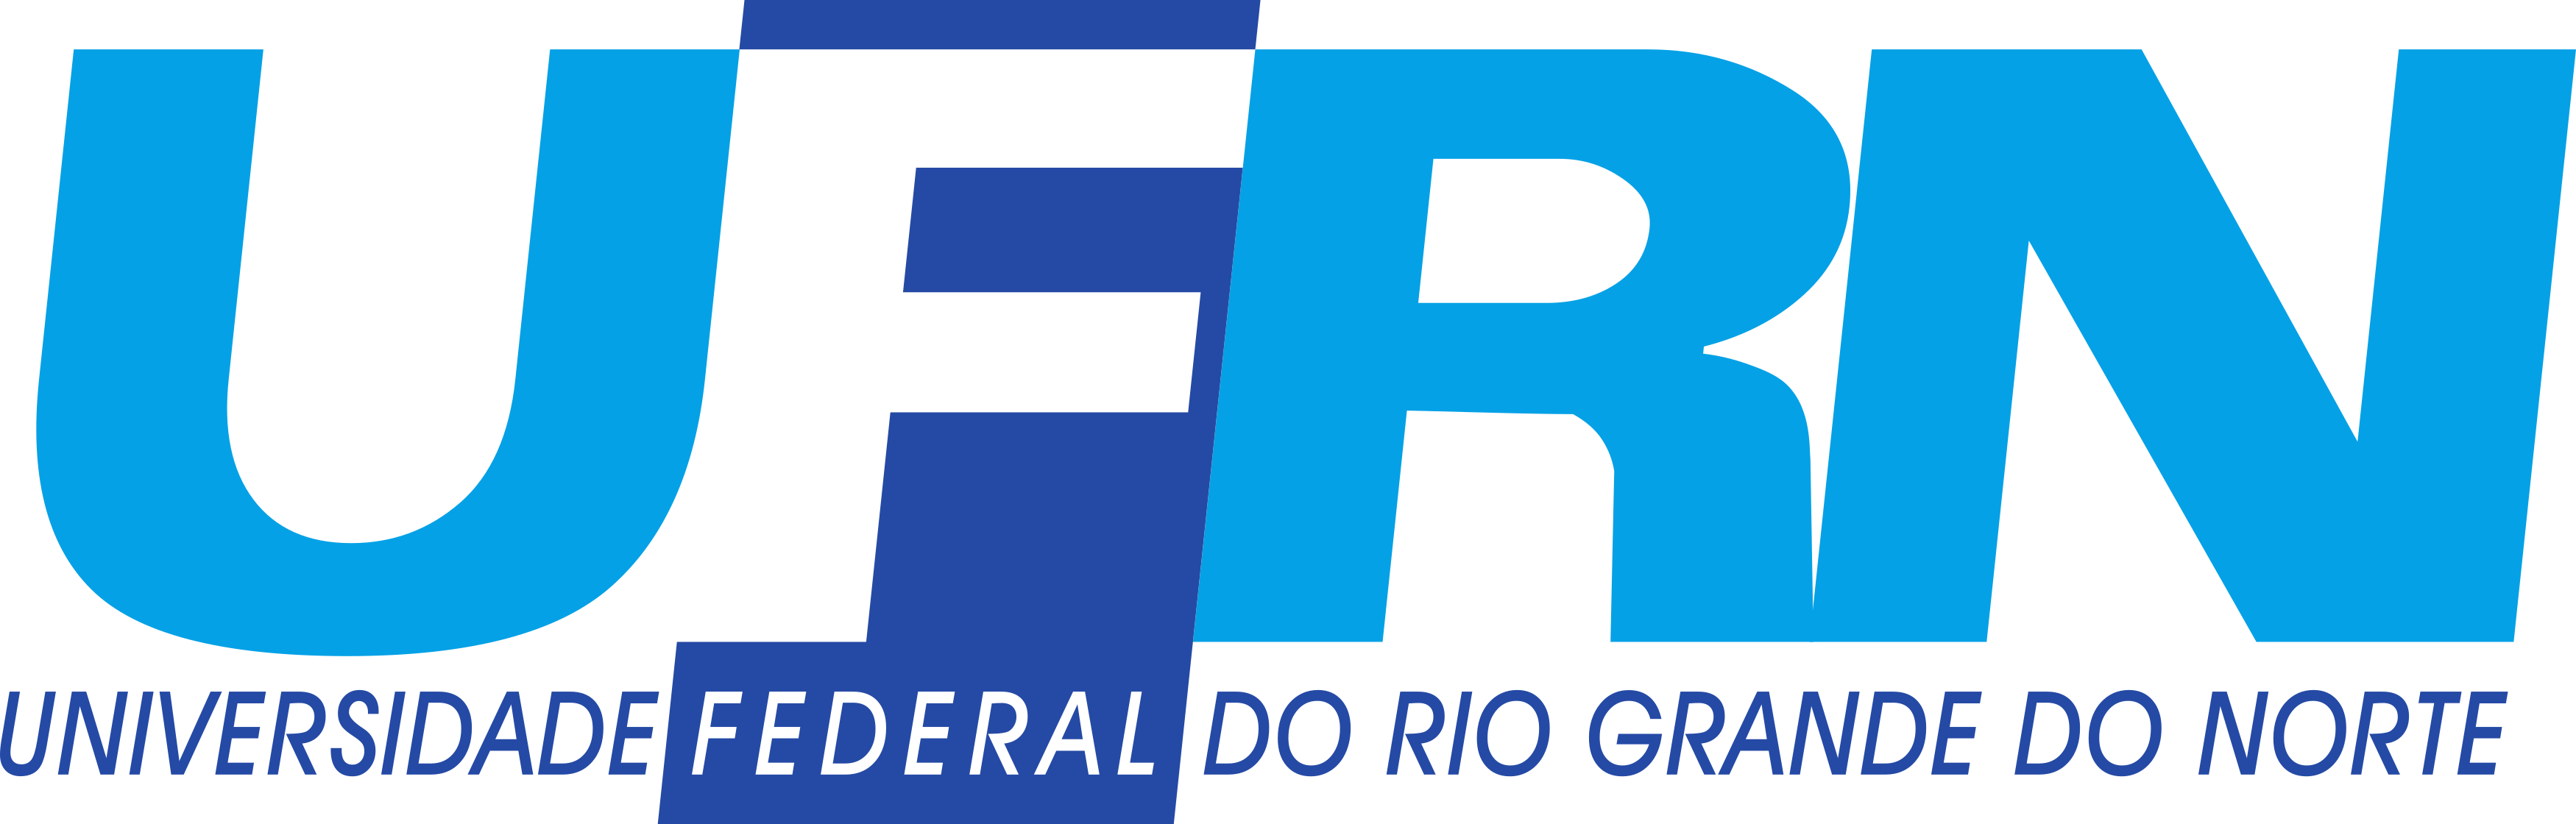 UFRN logo.